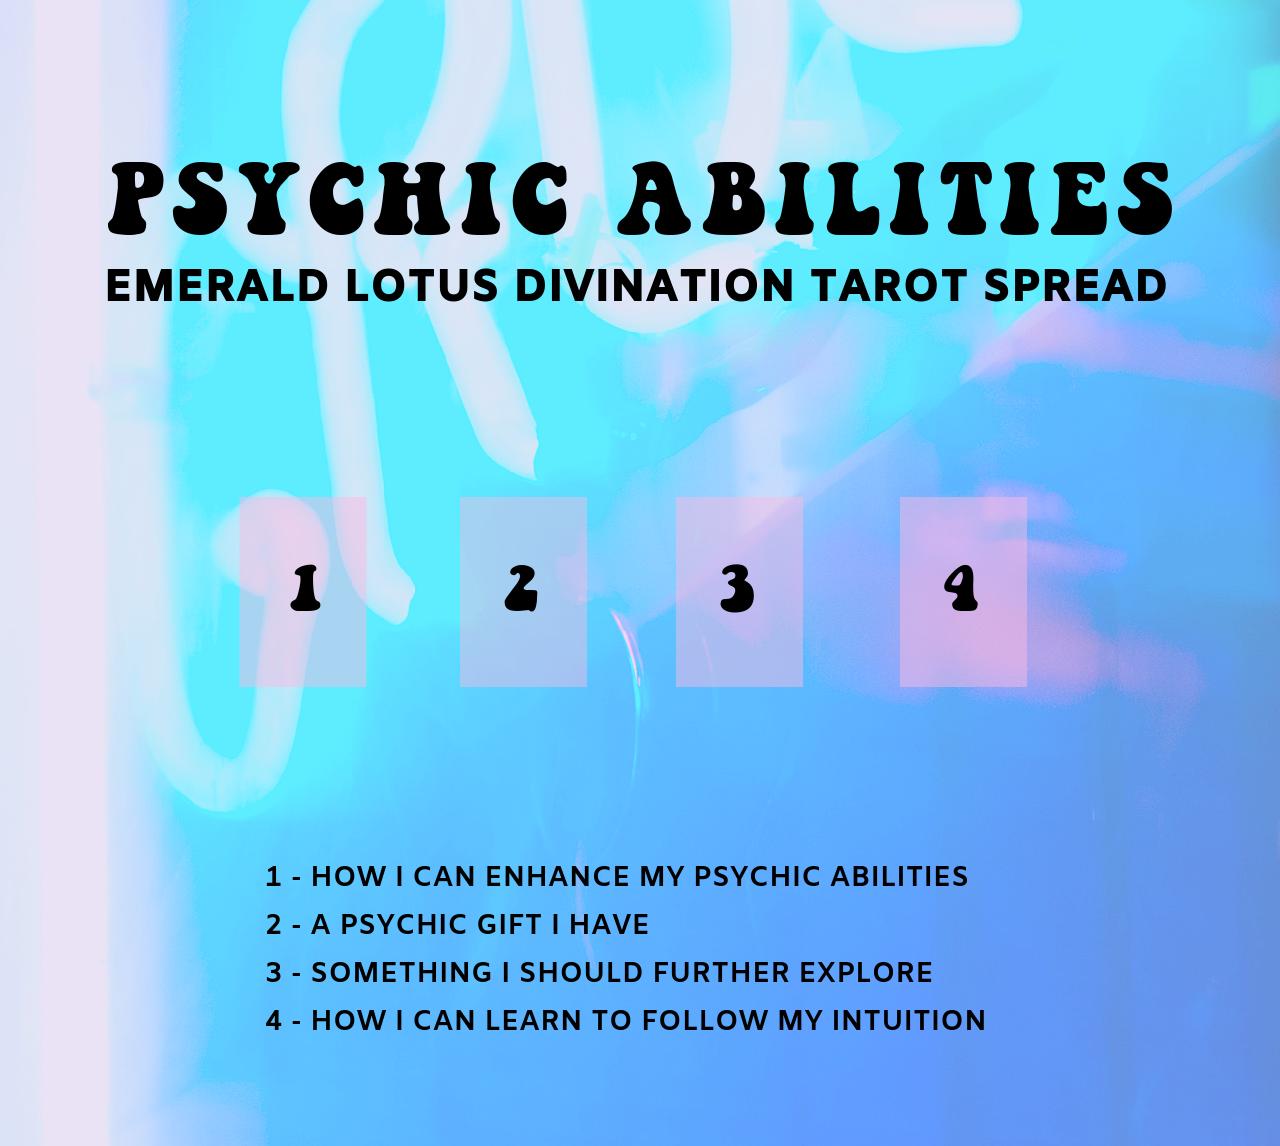 Psychic-Abilities-Tarot-Spread-Emerald-Lotus.png